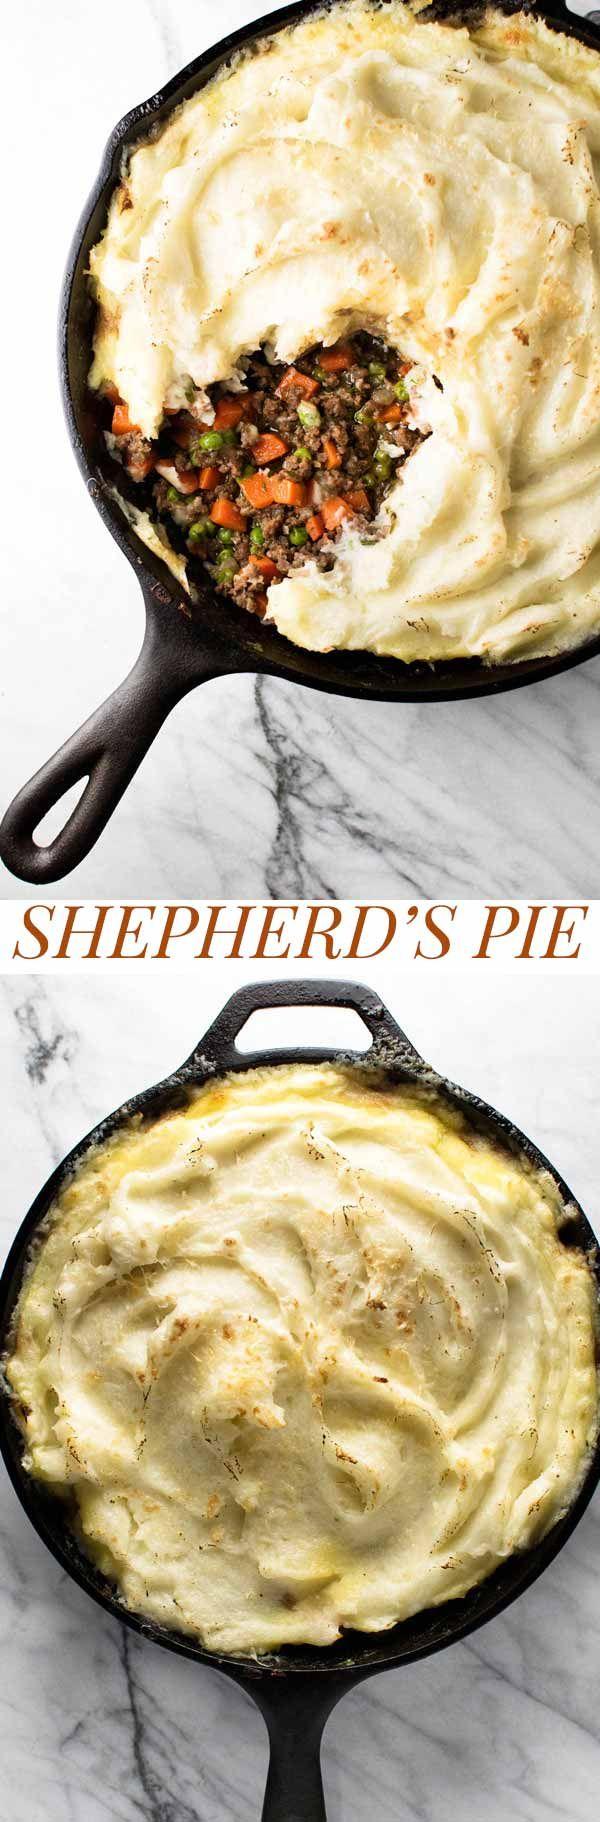 Shepherd S Pie Recipe In 2020 Beef Recipes Easy Delicious Beef Recipe Shepherds Pie